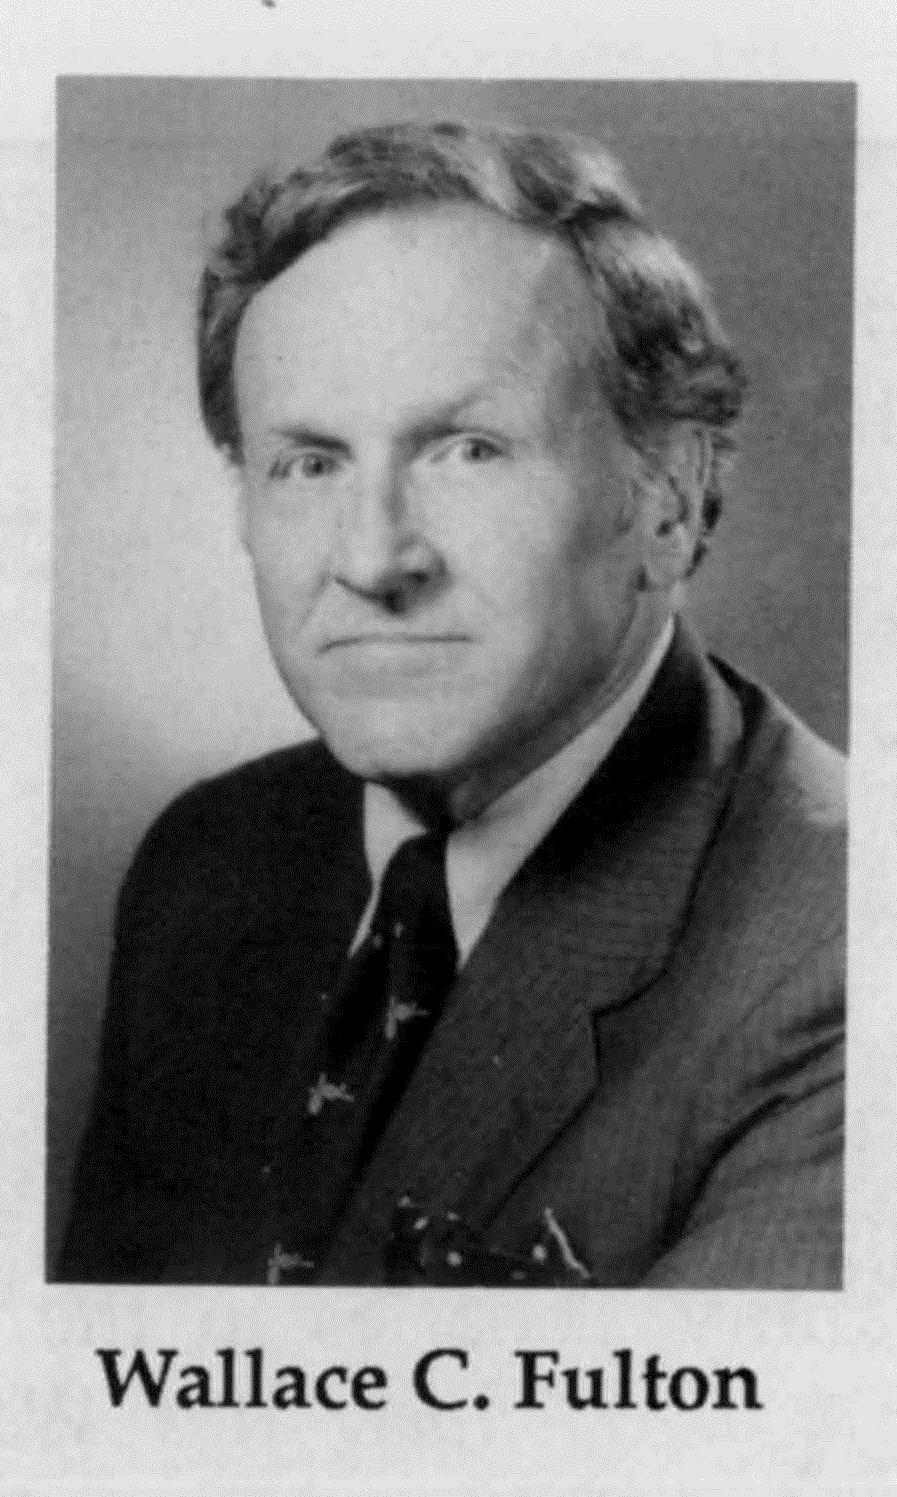 Wallace Fulton